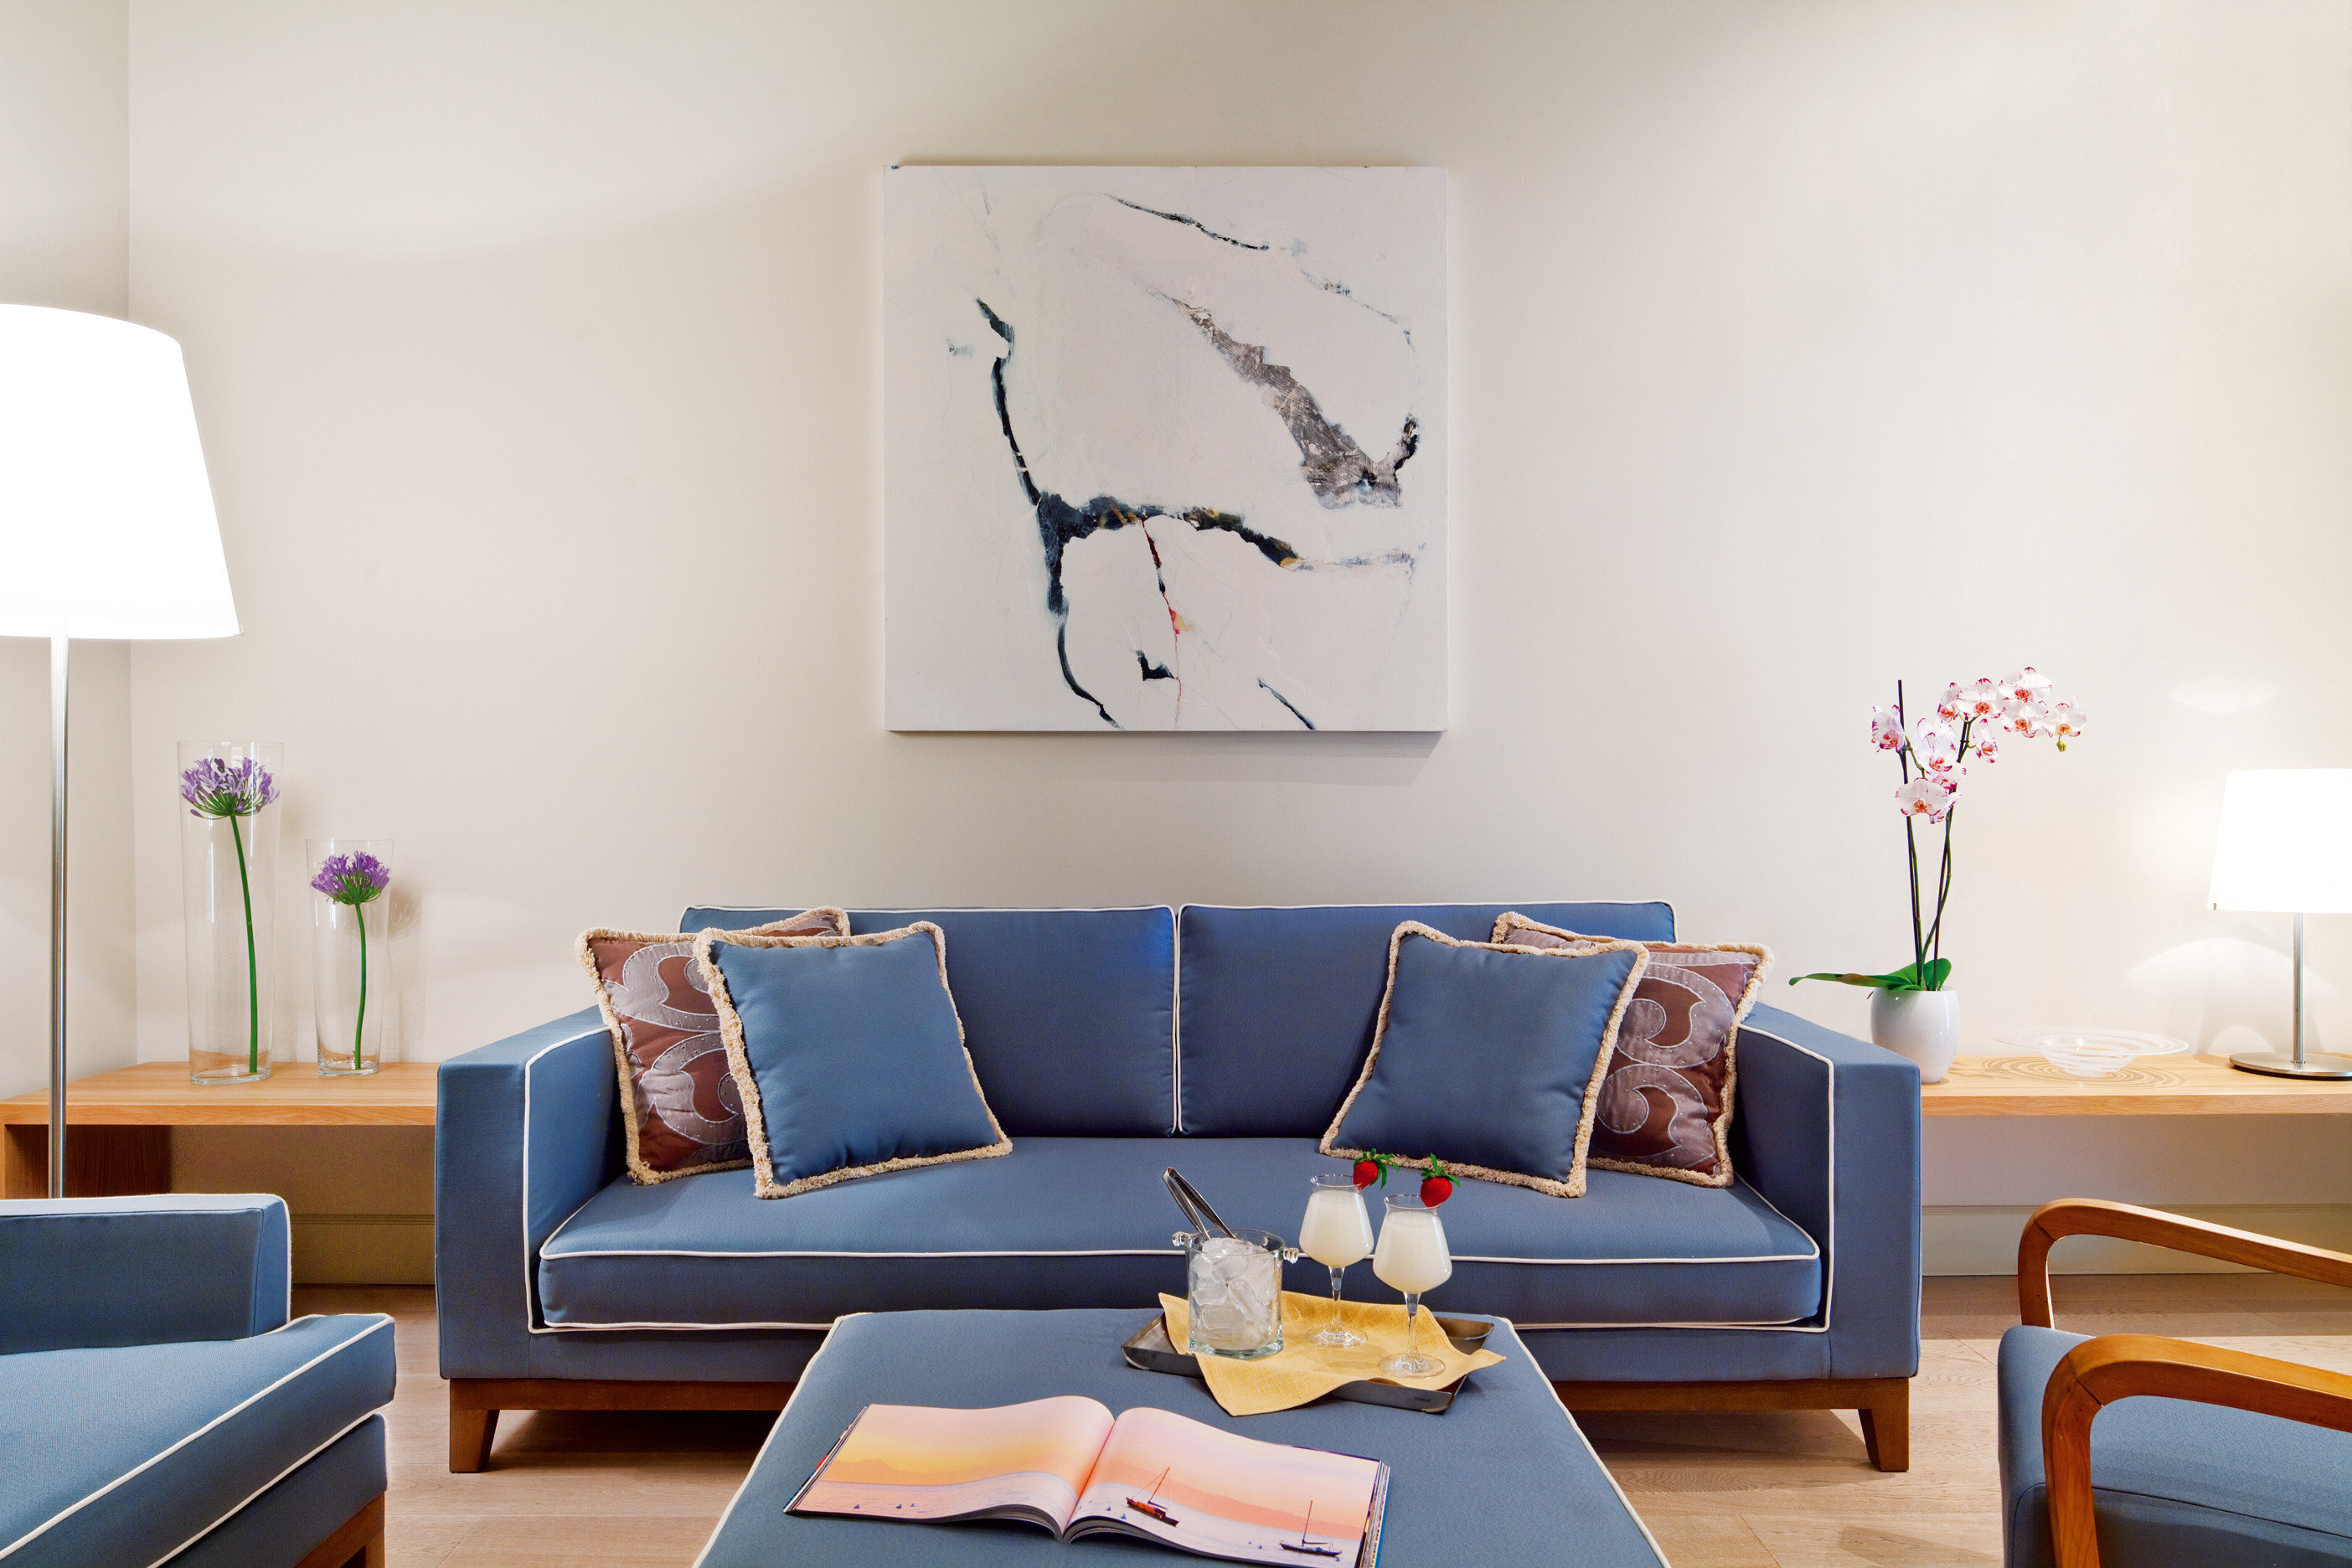 Hotels wall indoor Living room living room interior design home Design modern art furniture sofa window covering apartment